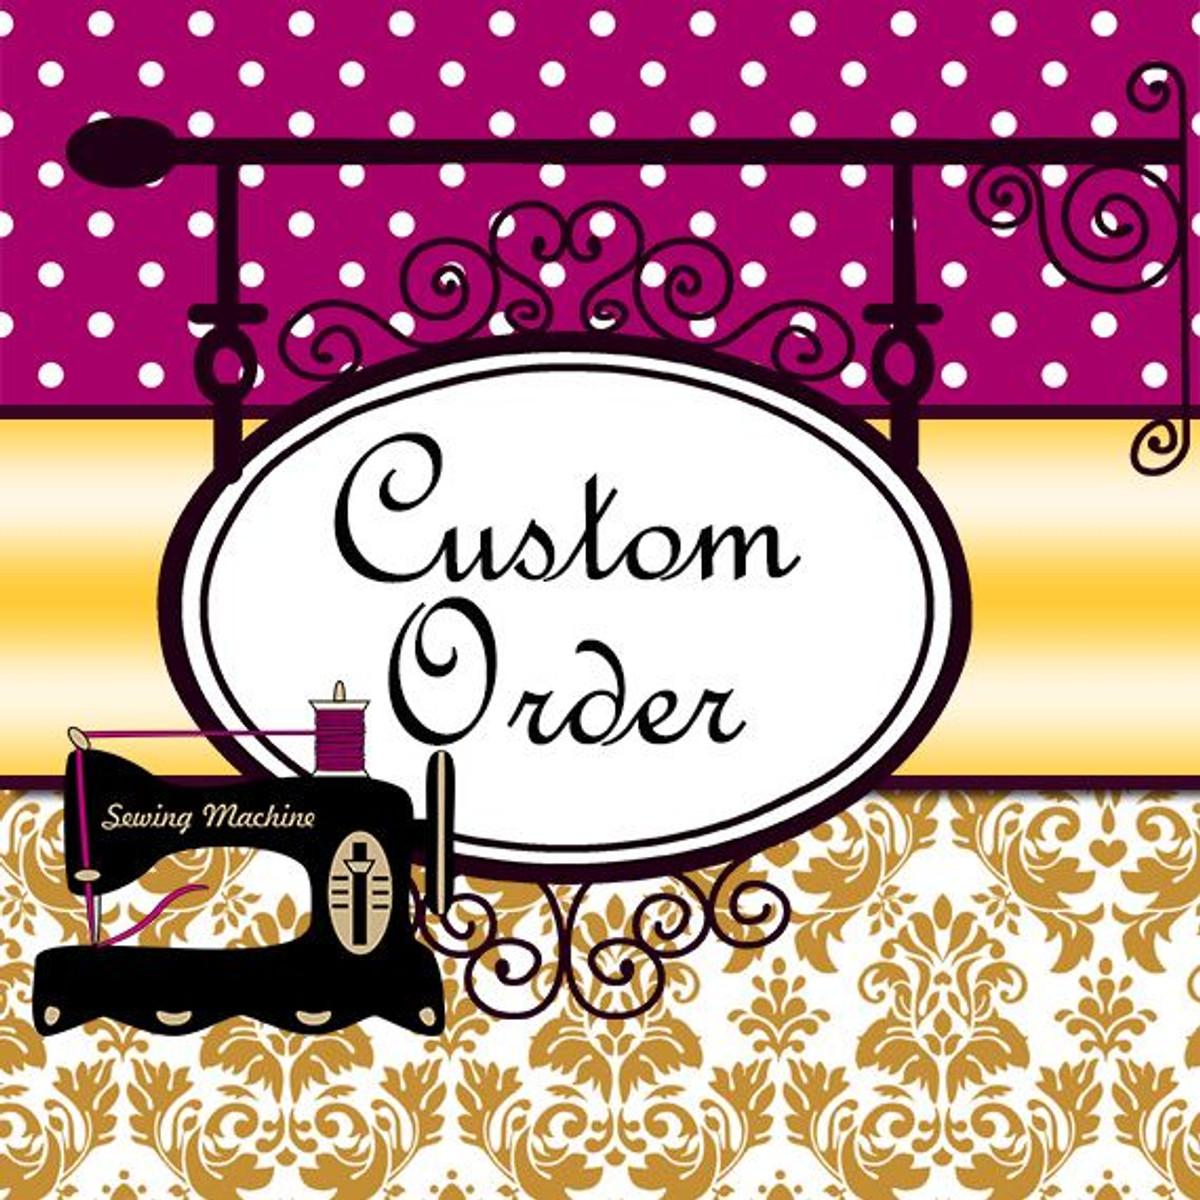 Custom Wedding Dress for Aimee H